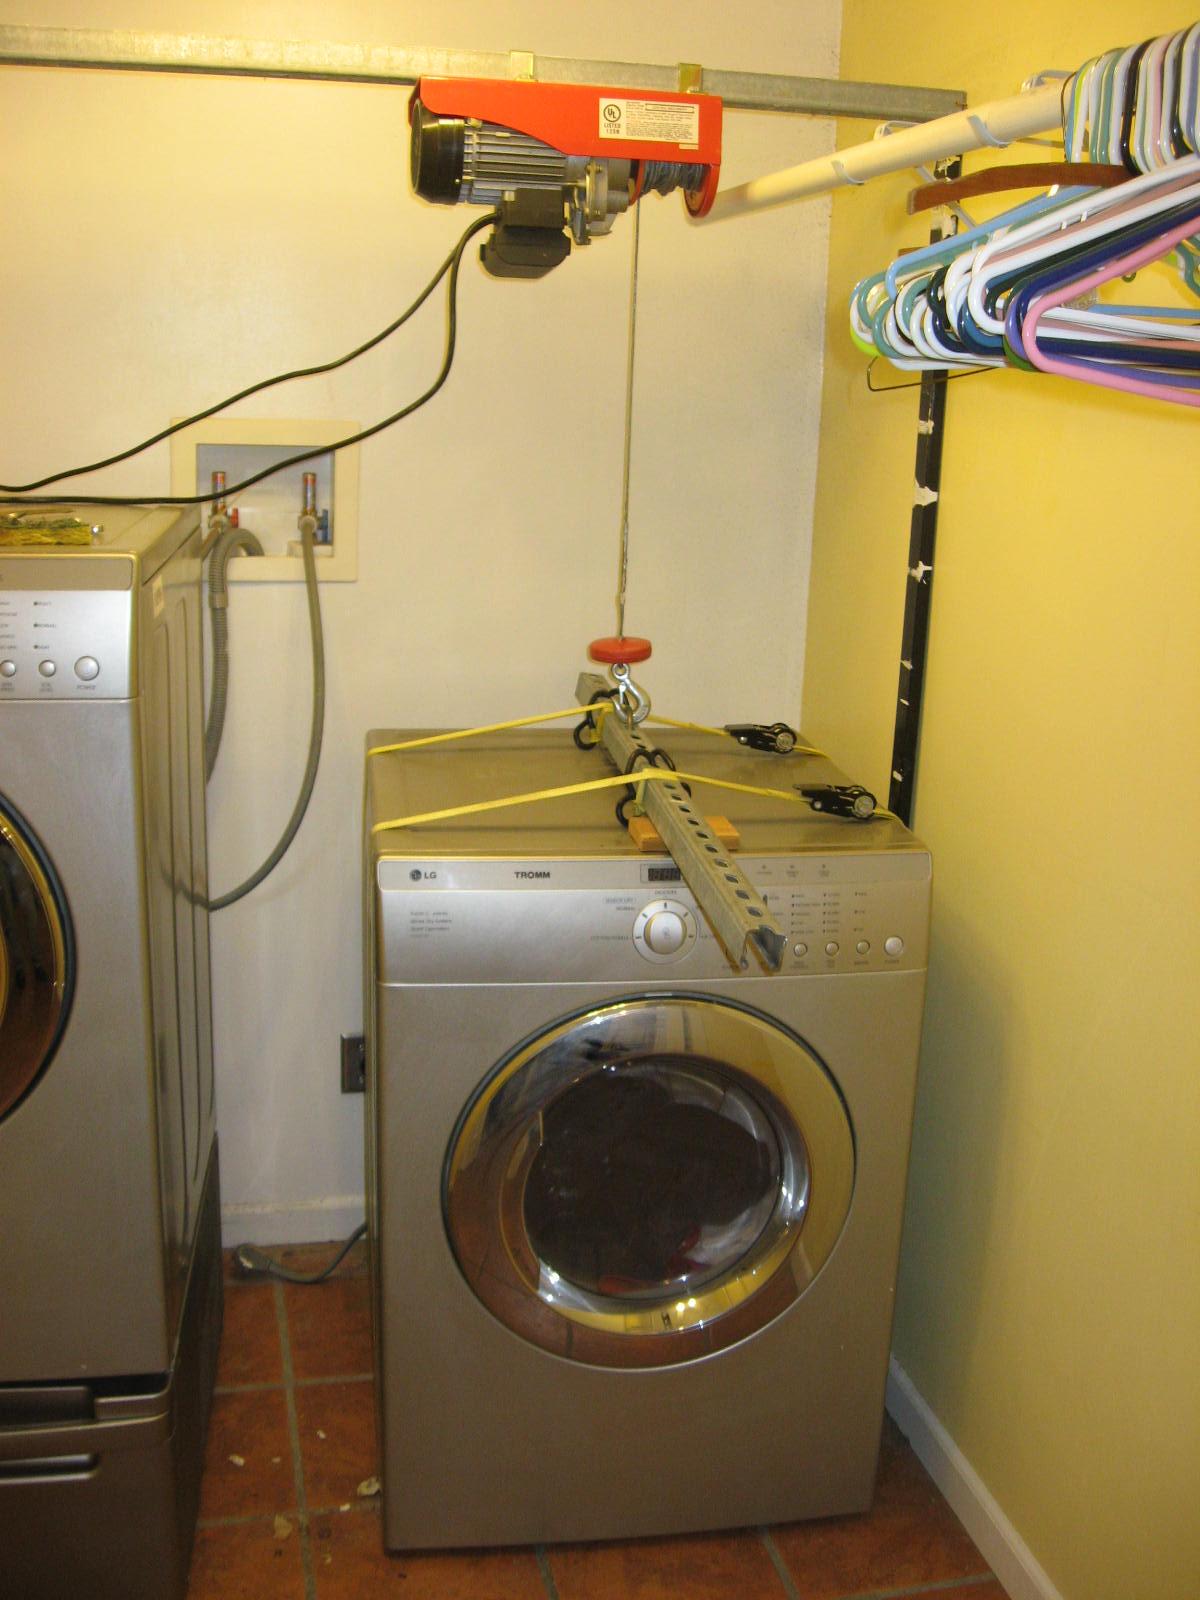 pedestal dispatcher ge front requesttype load spec product laundry parts image appliances store pedestals name